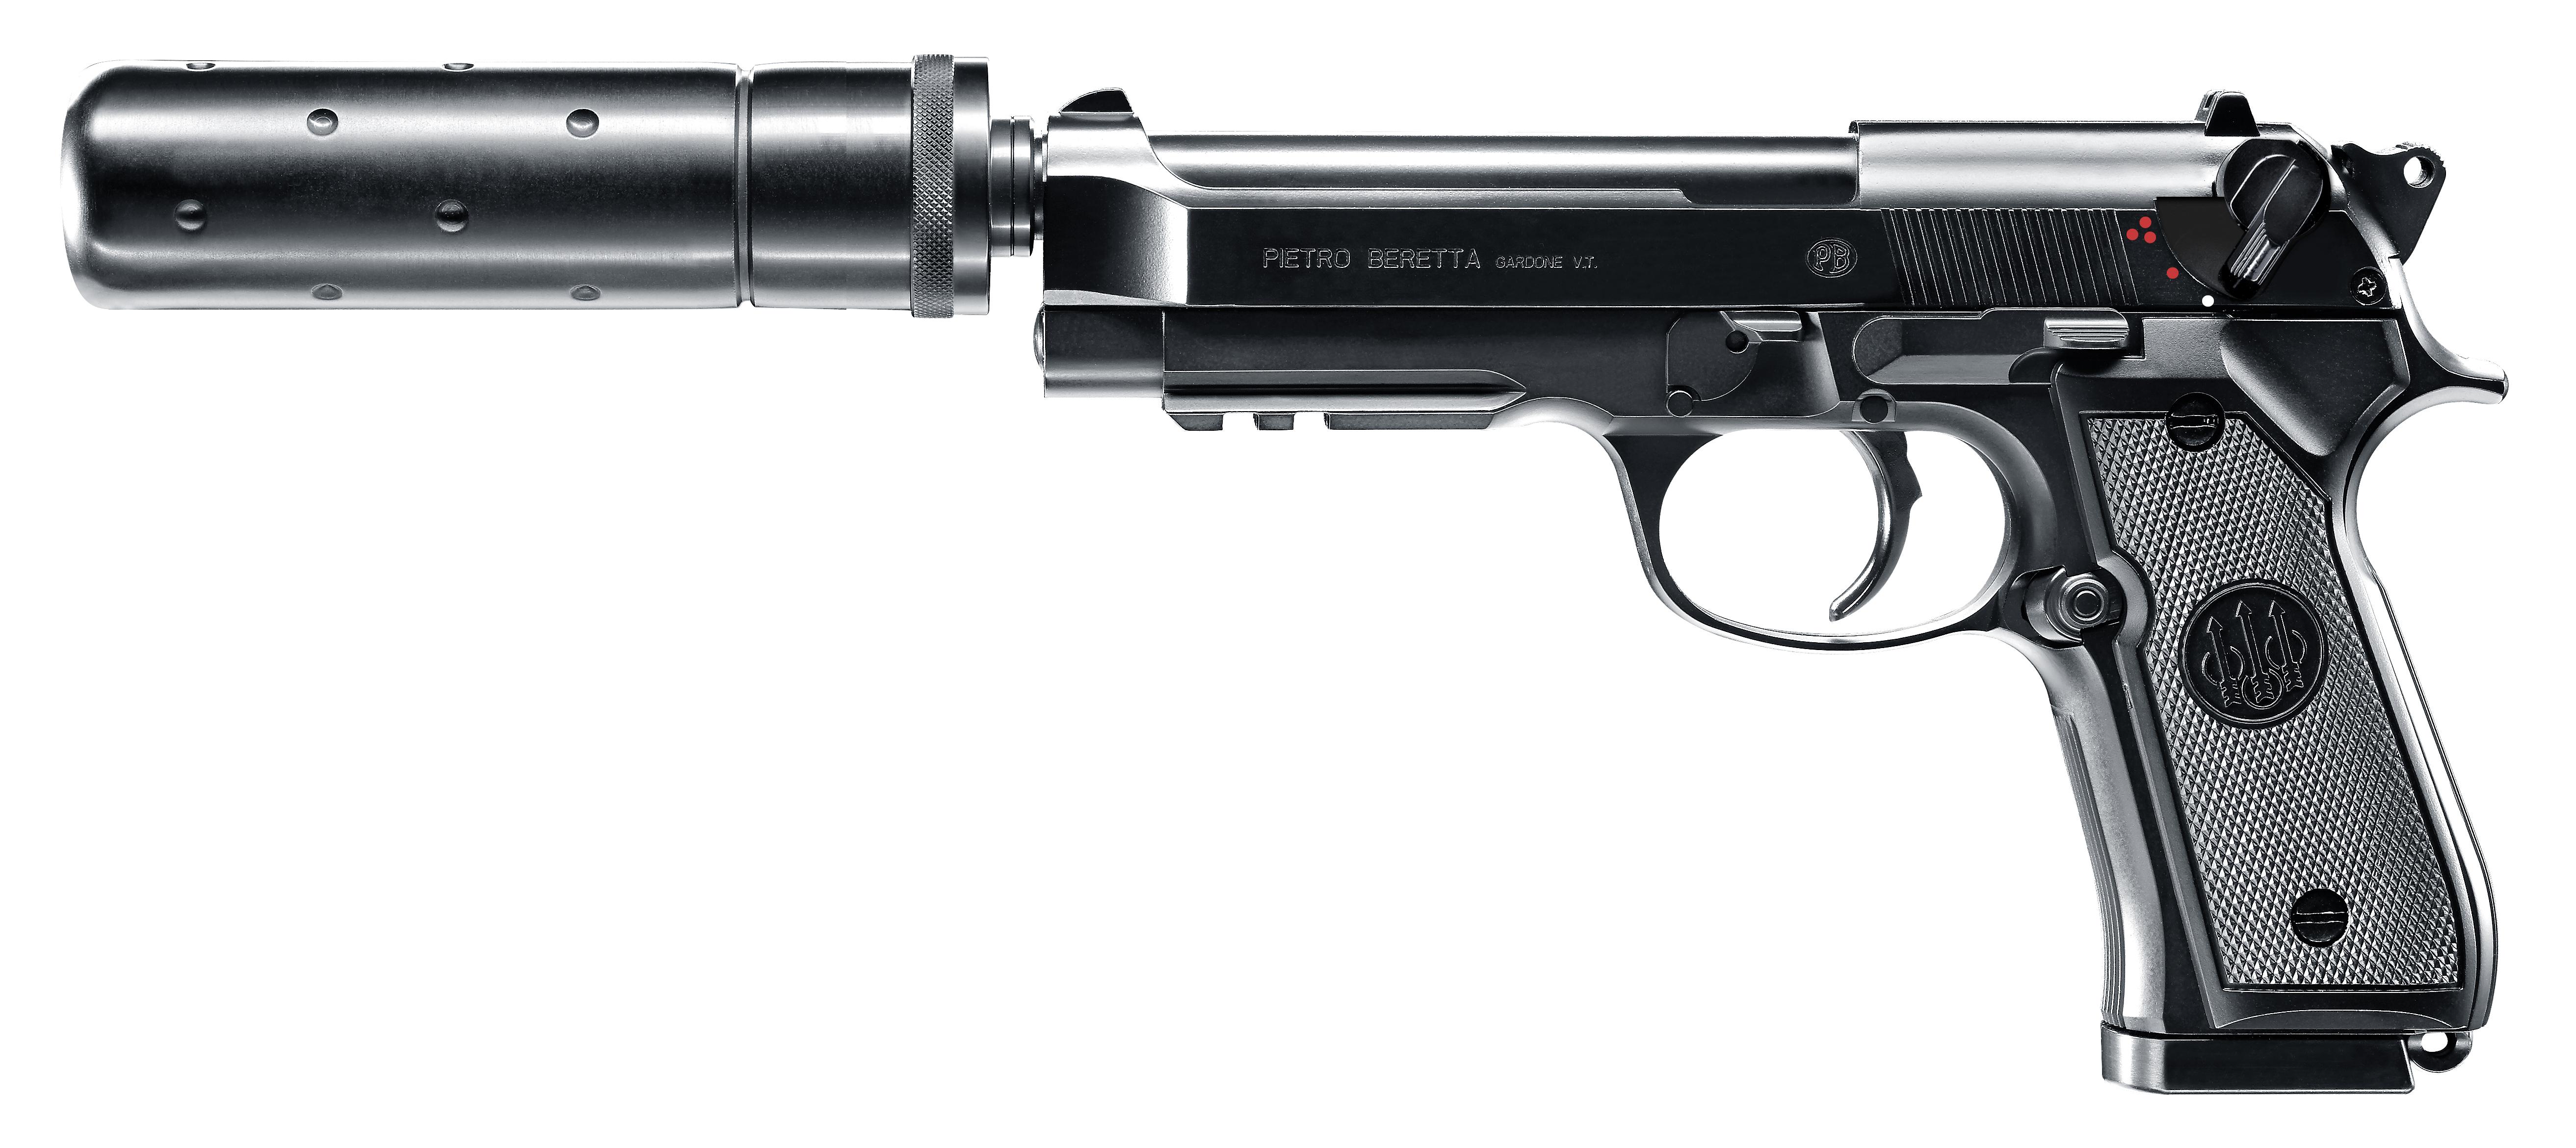 BERETTA (Umarex) Airsoft AEG M92 A1 Tactical